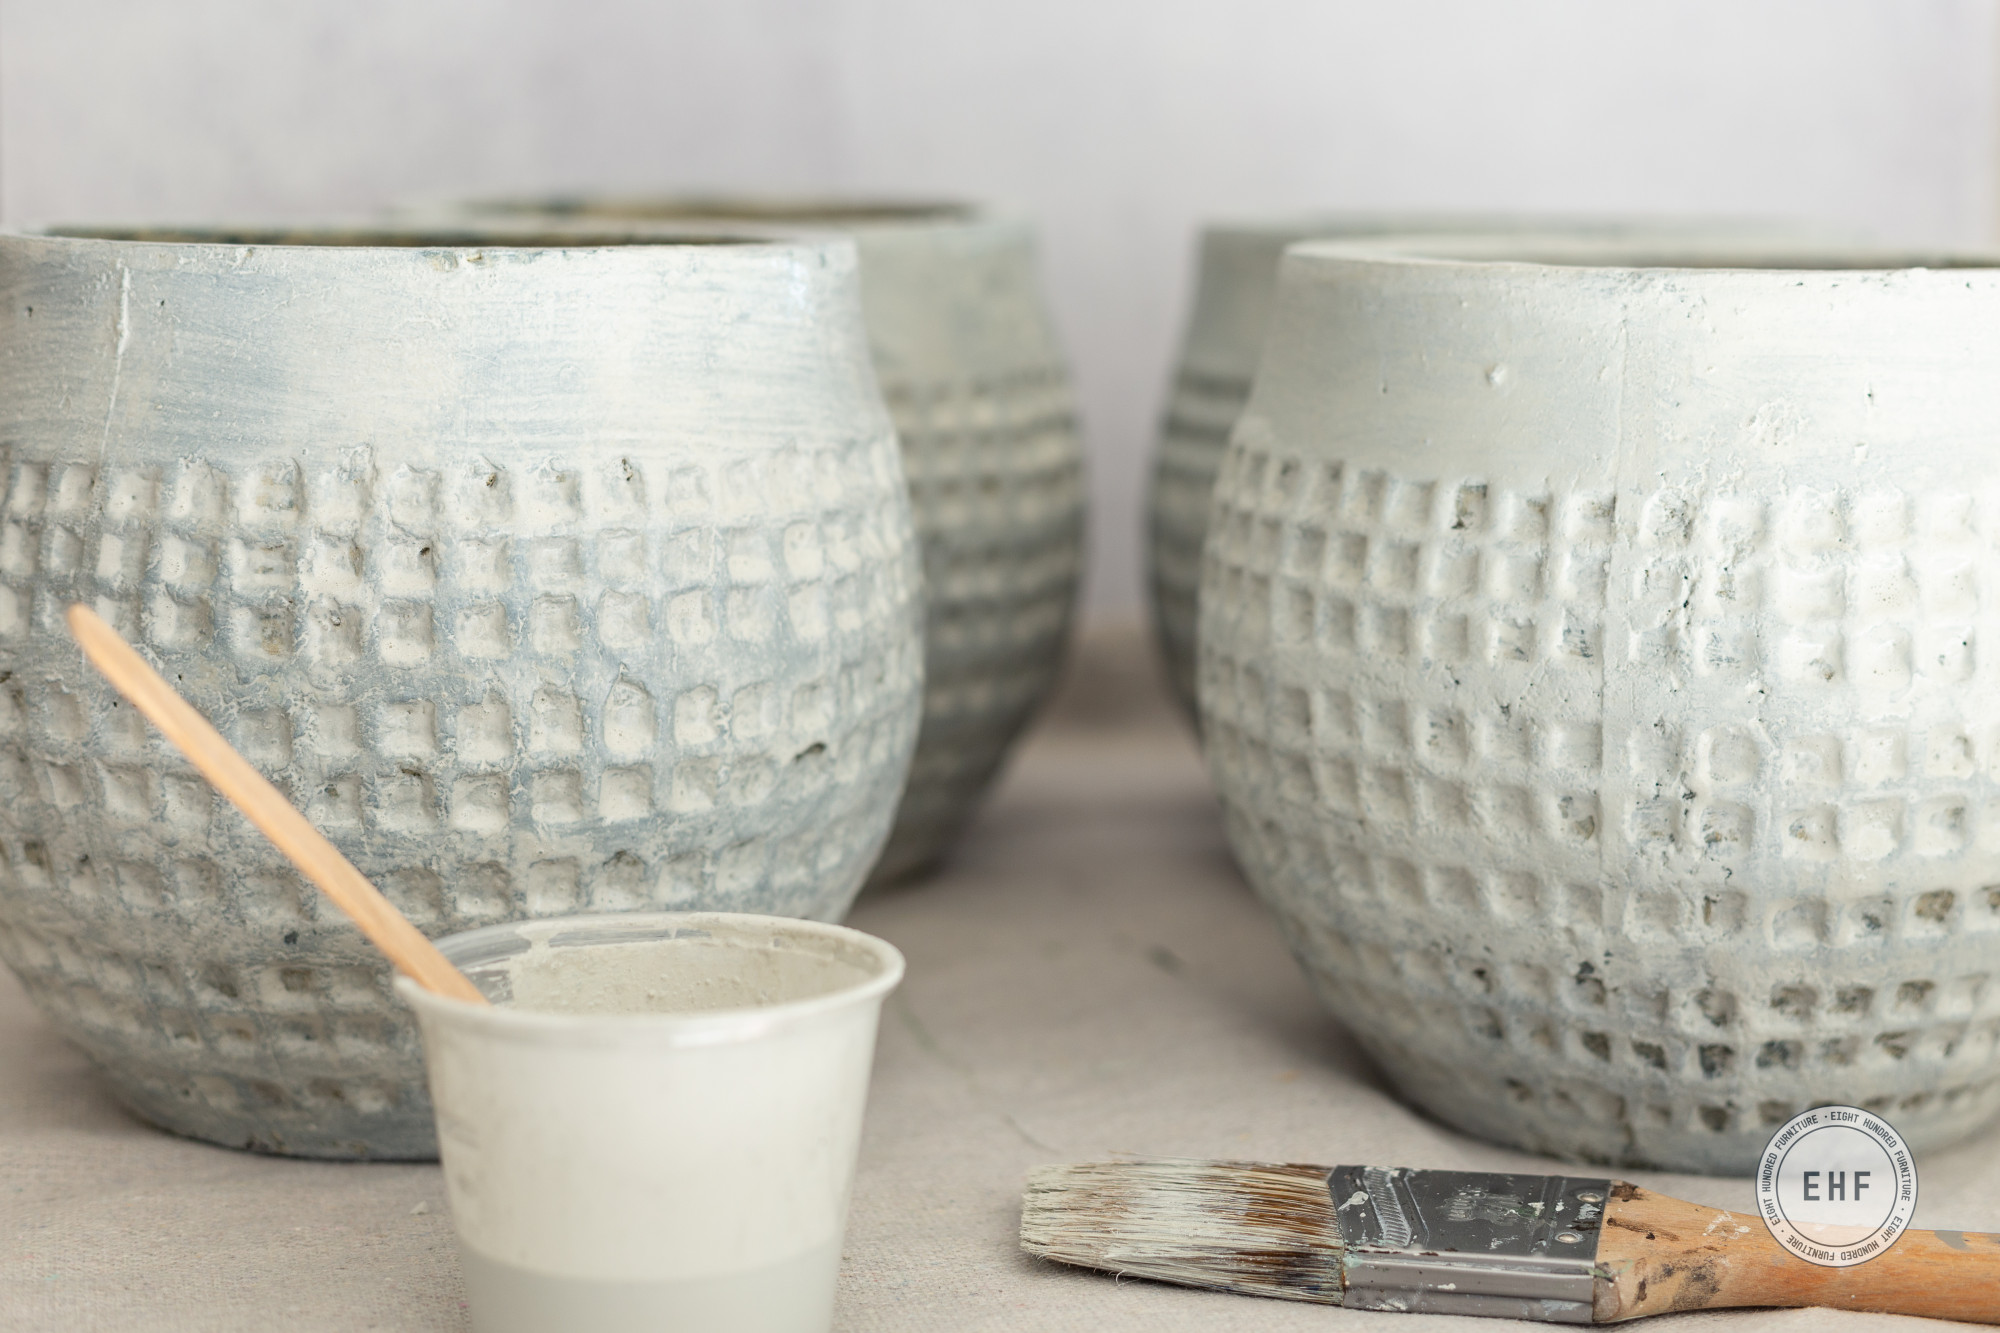 Teal ceramic pot, Mora Milk Paint, Miss Mustard Seed's Milk Paint, Eight Hundred Furniture, Macrame Pot Hanger